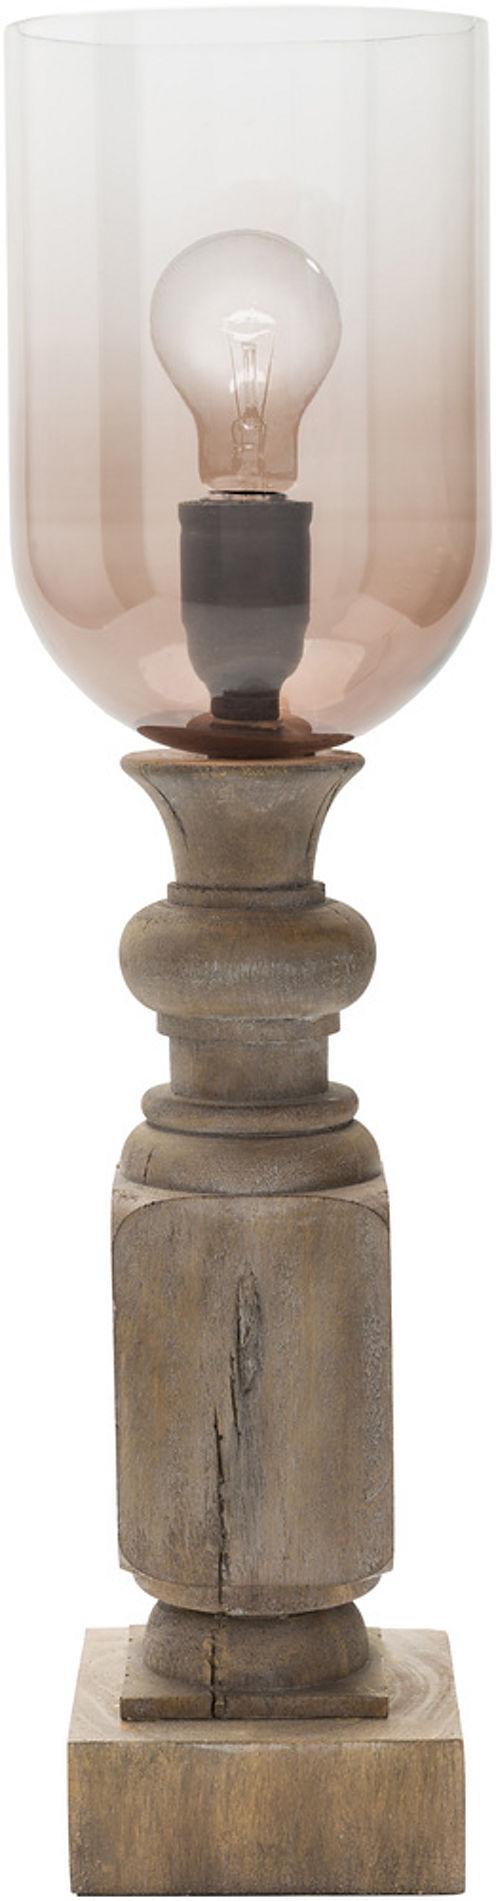 Décor 140 Lavarone 23x6x6 Indoor Table Lamp - Brown